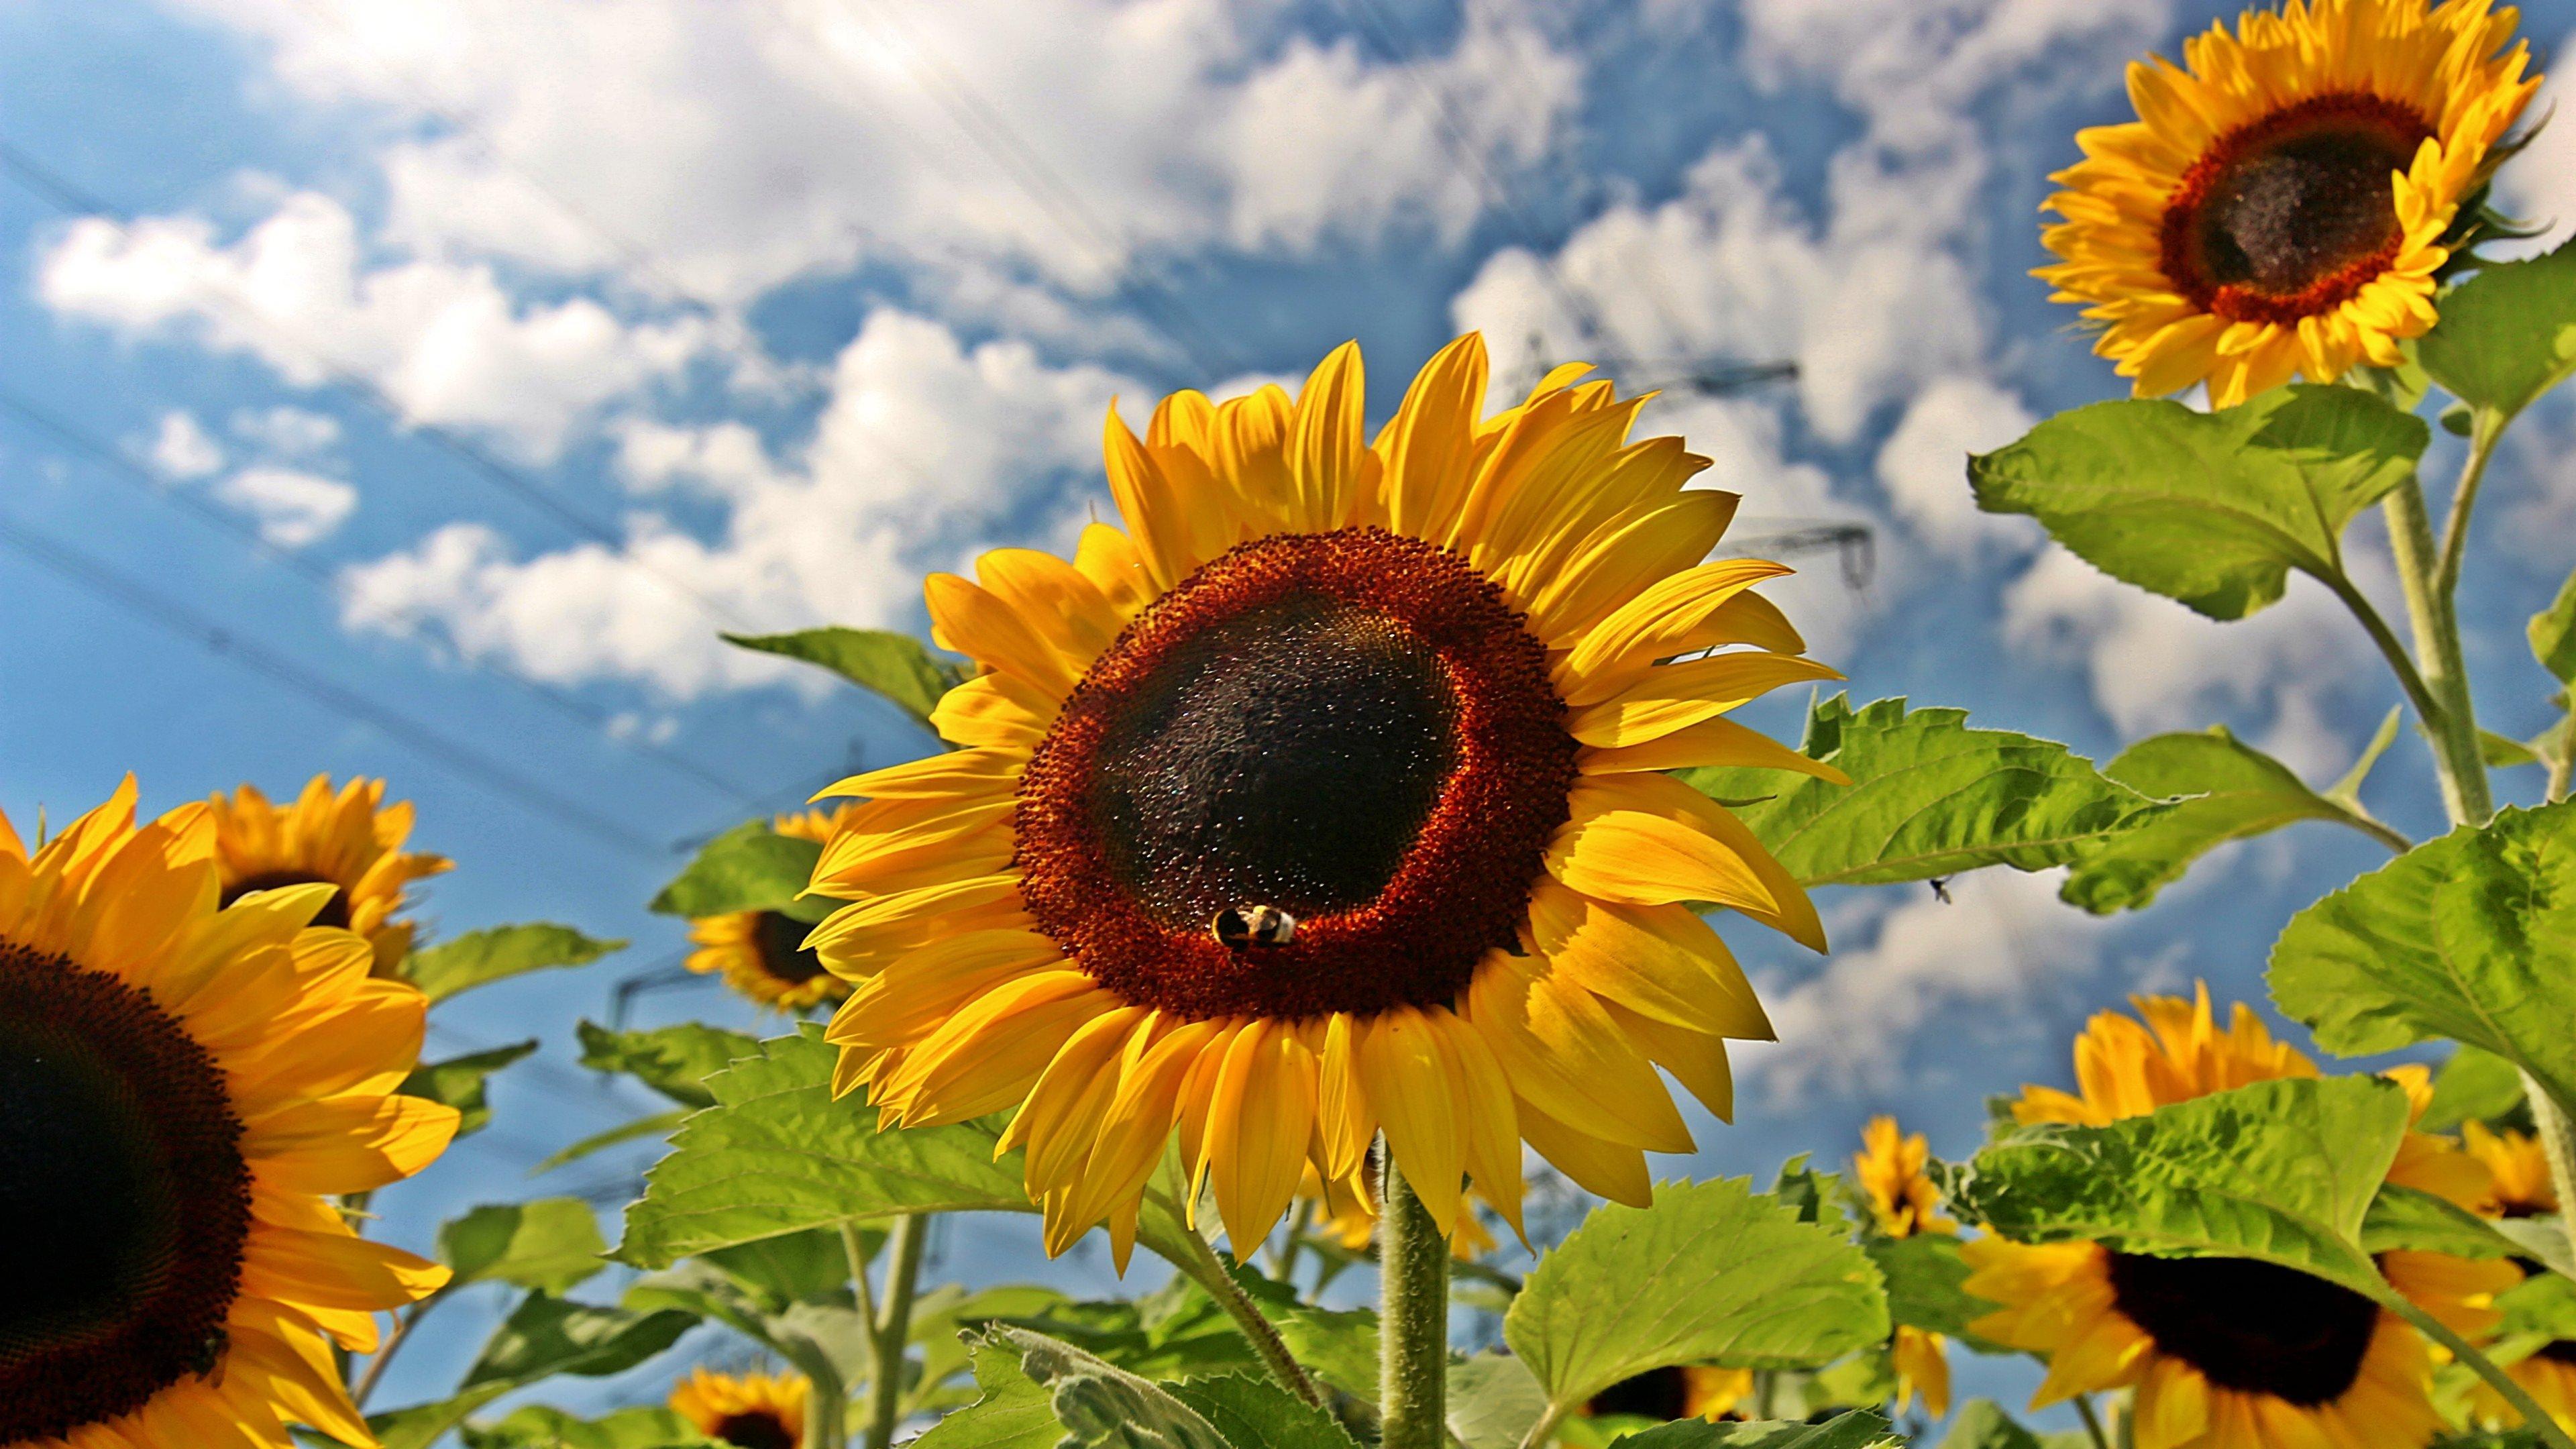 Sunflower wallpapers HD for desktop backgrounds